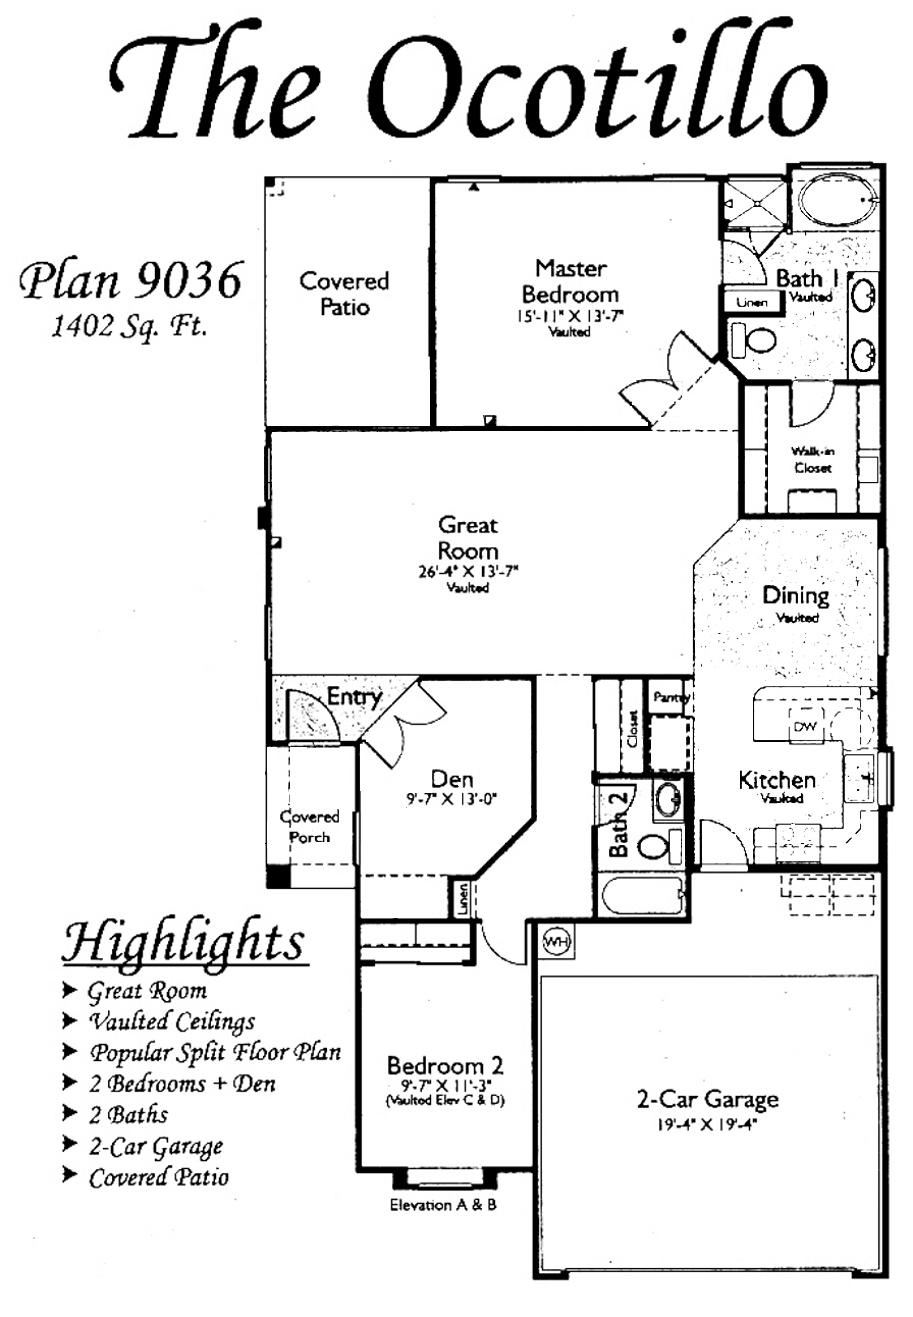 Floor Plans For The Ocotillo Models Inside Arizona